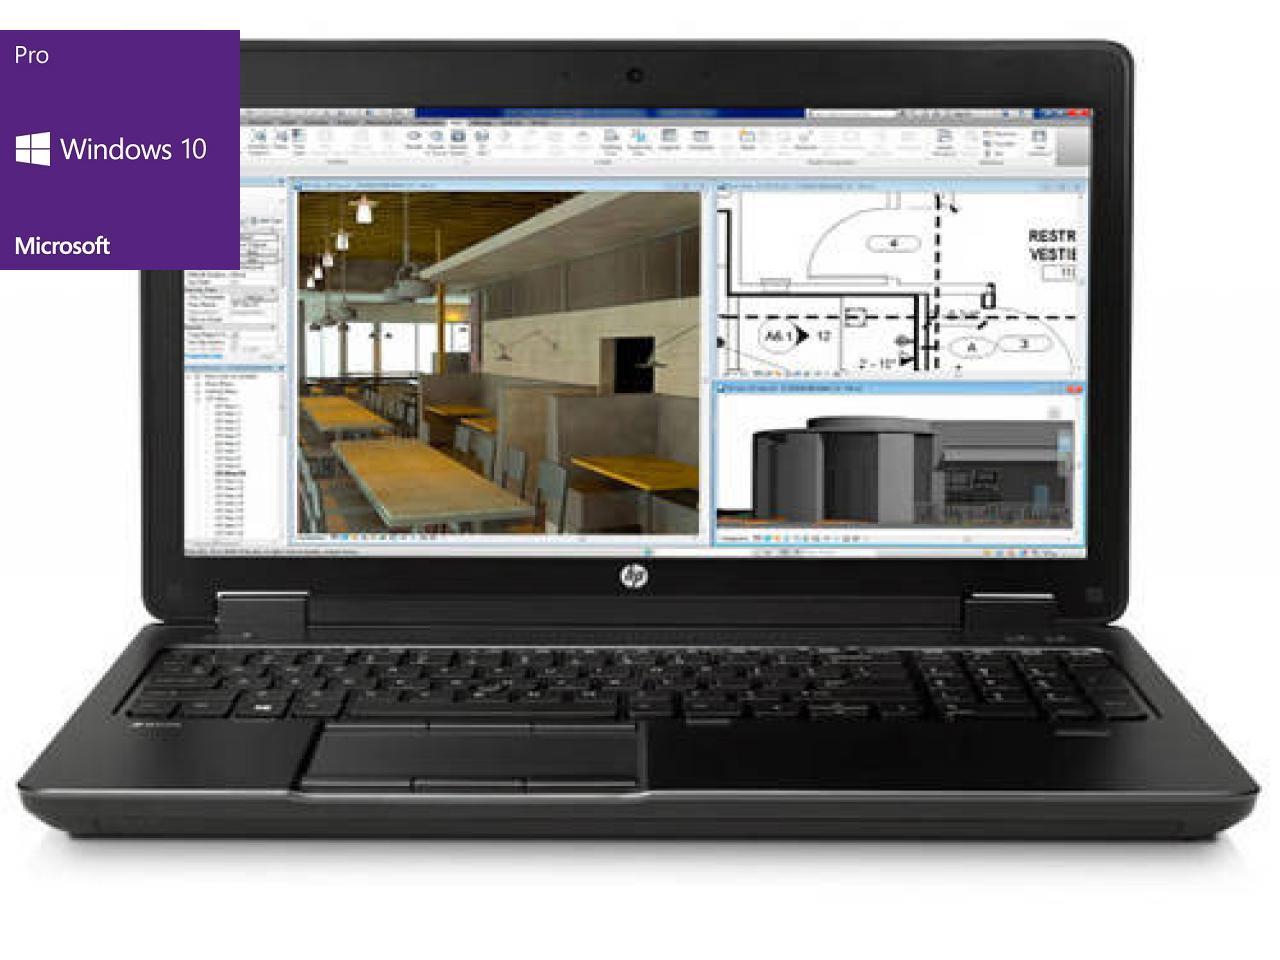 Hewlett Packard ZBook 15 (DC)